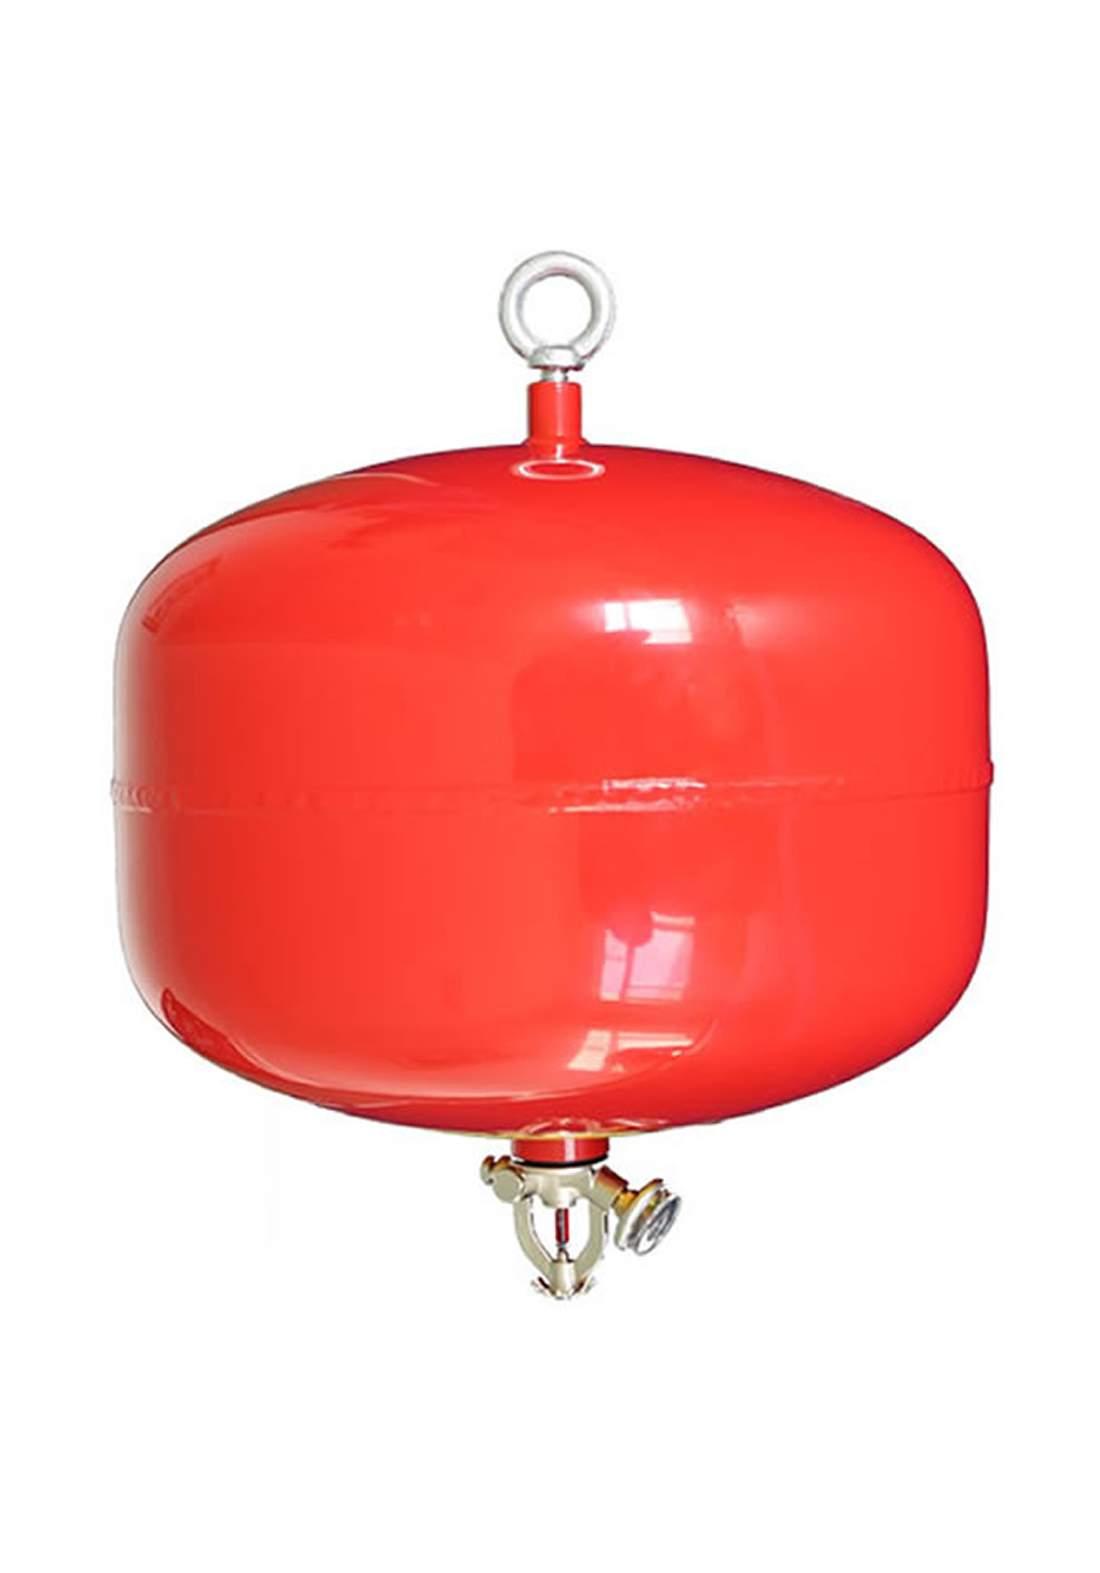 Subul AlHurra Ceiling Fire Extinguisher 6 kg مطفأة حريق سطحية باودر